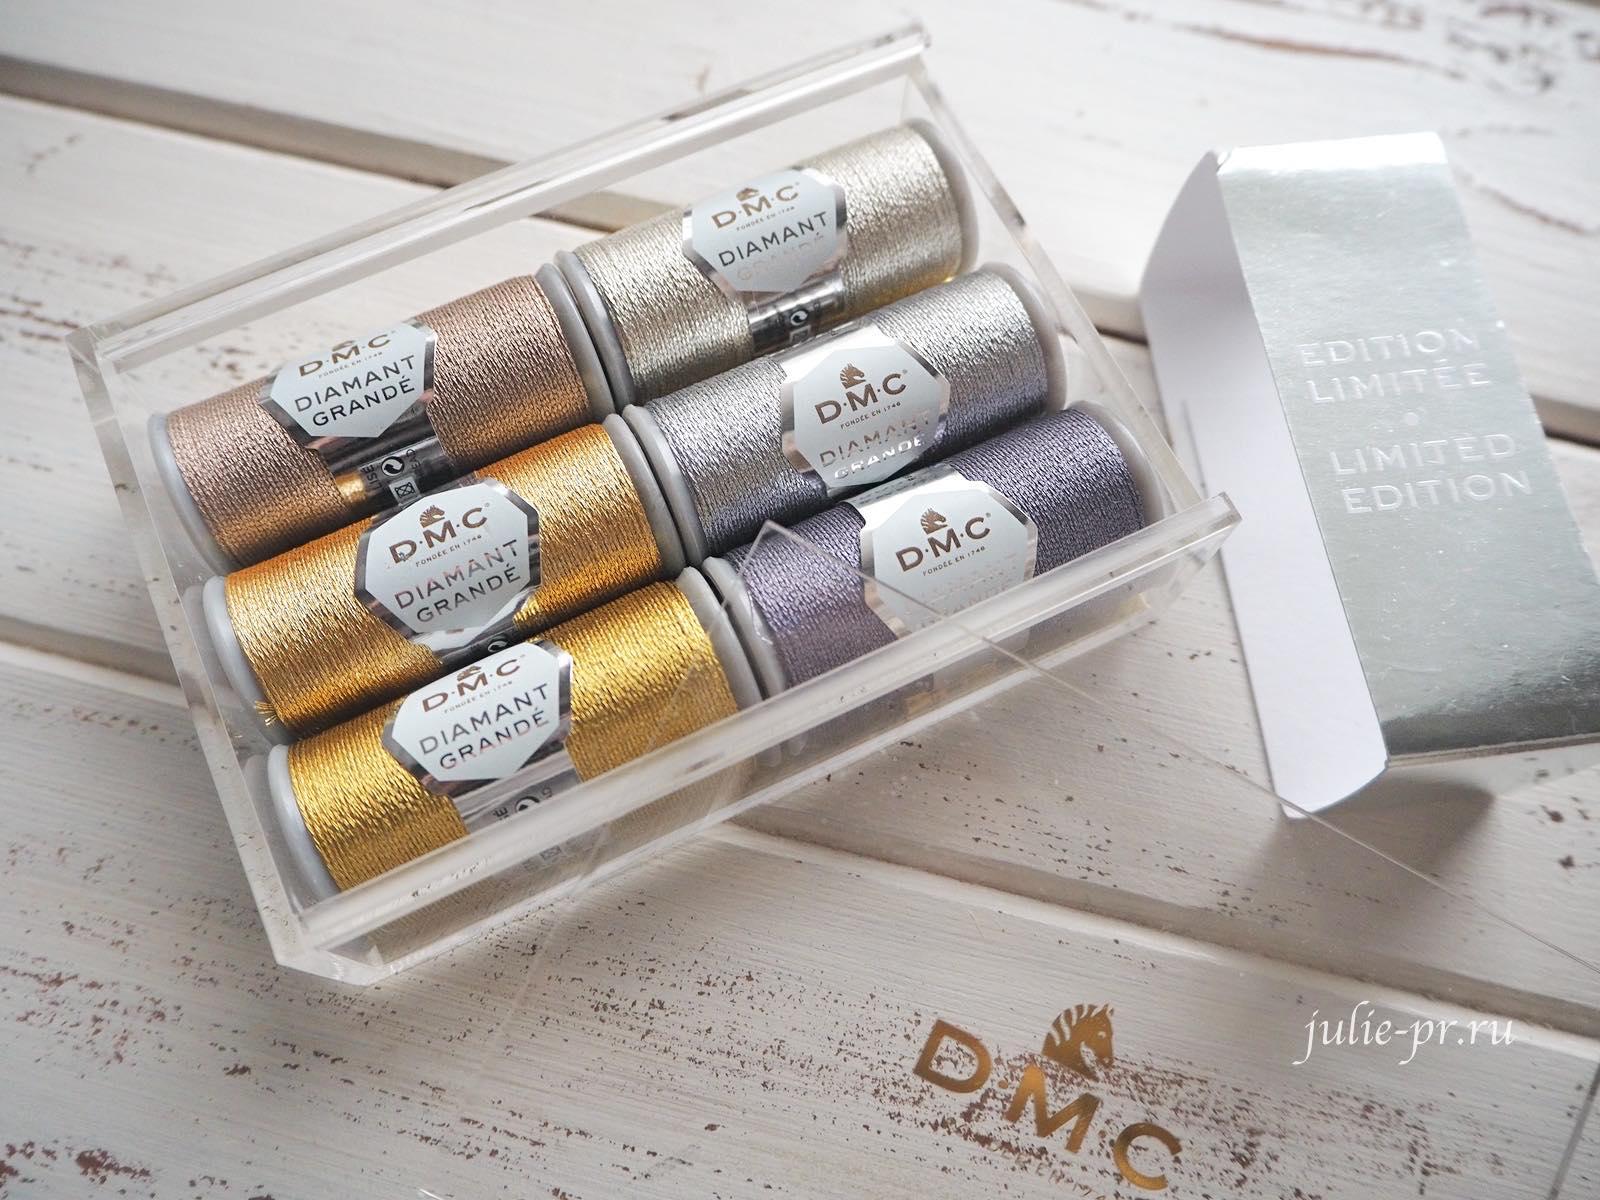 Нитки DMC Diamant Grande, вышивка